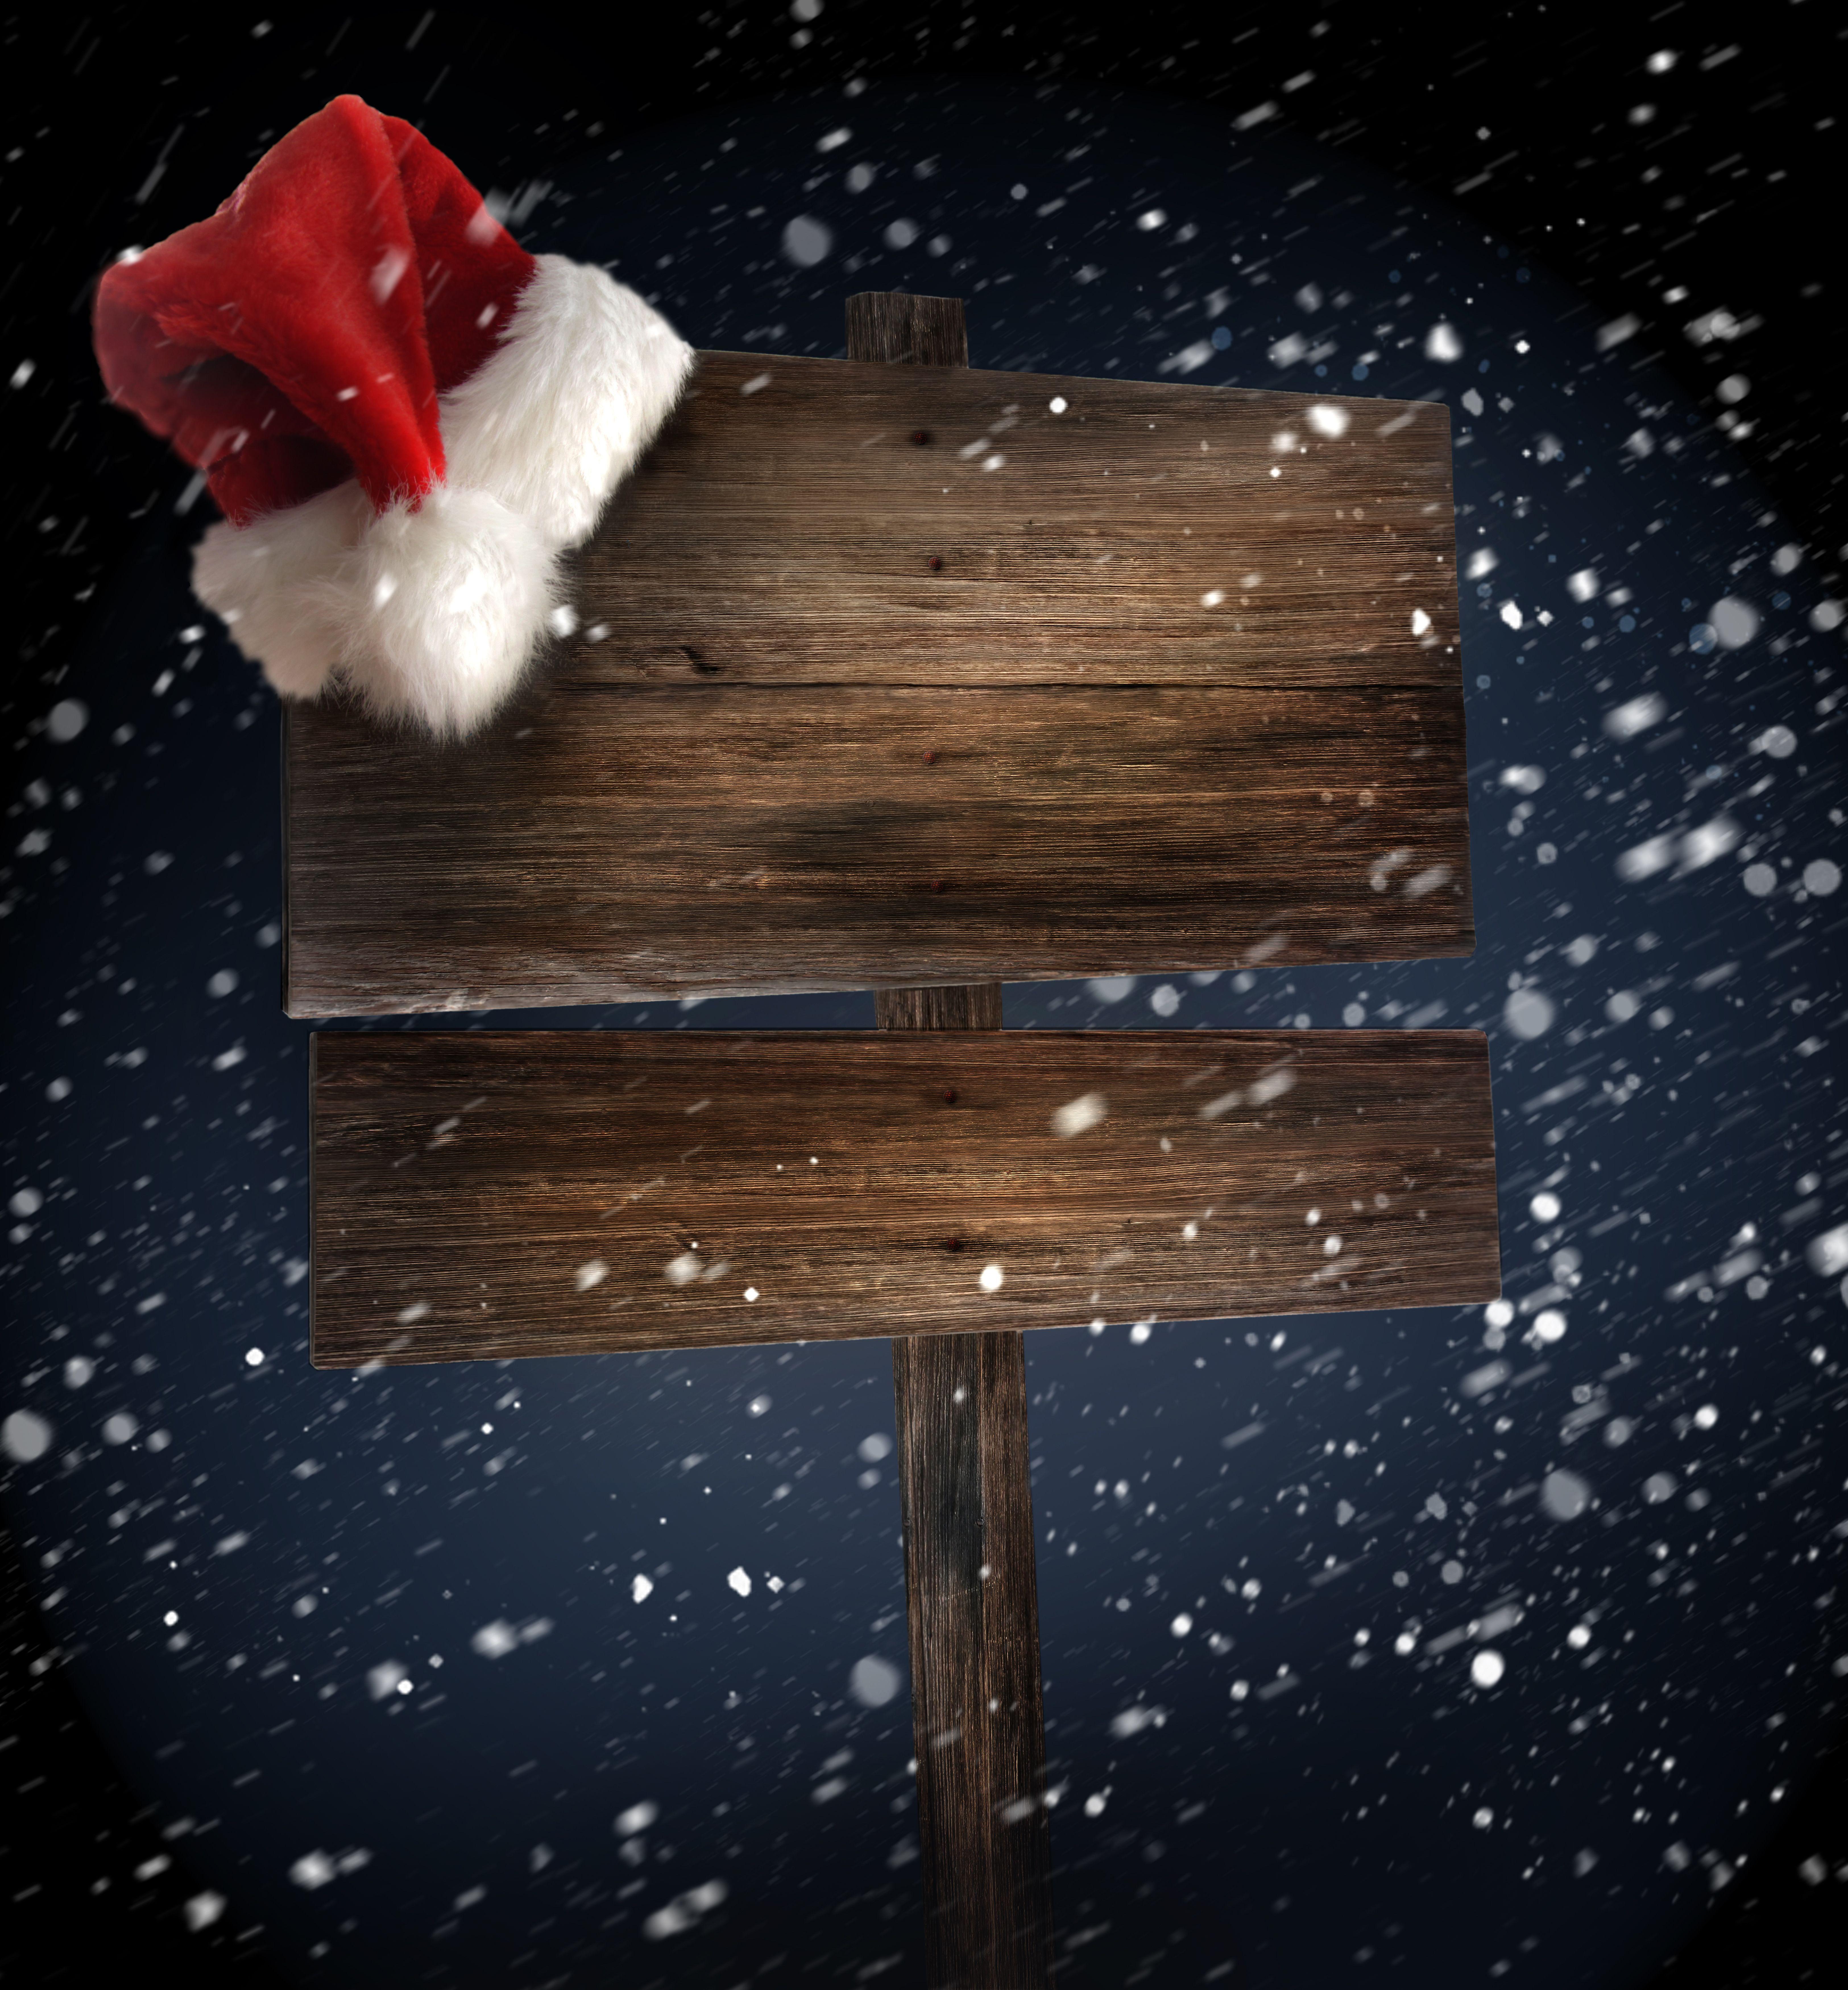 Weihnachten Weihnachten Schnee Im Hintergrund Christmas Wallpaper Backgrounds Christmas Postcard Christmas Photography Backdrops